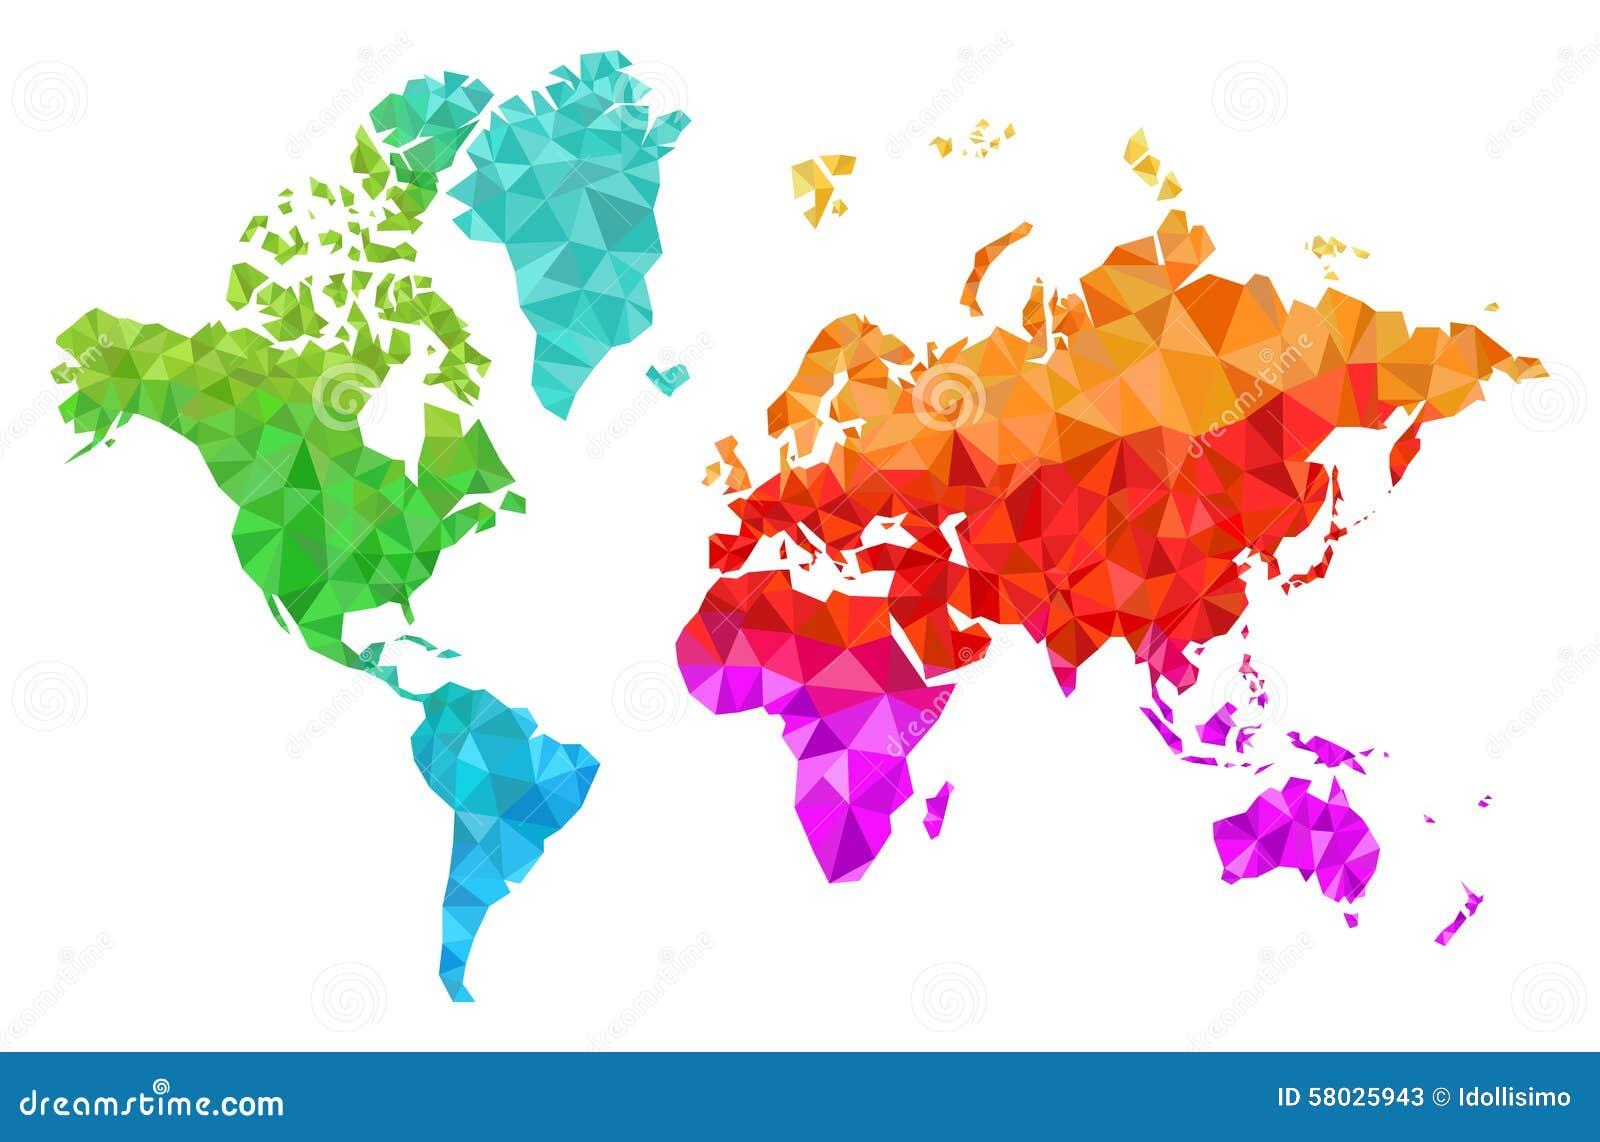 Geometric world map in colors stock vector illustration - Colores del mundo de bruguer ...